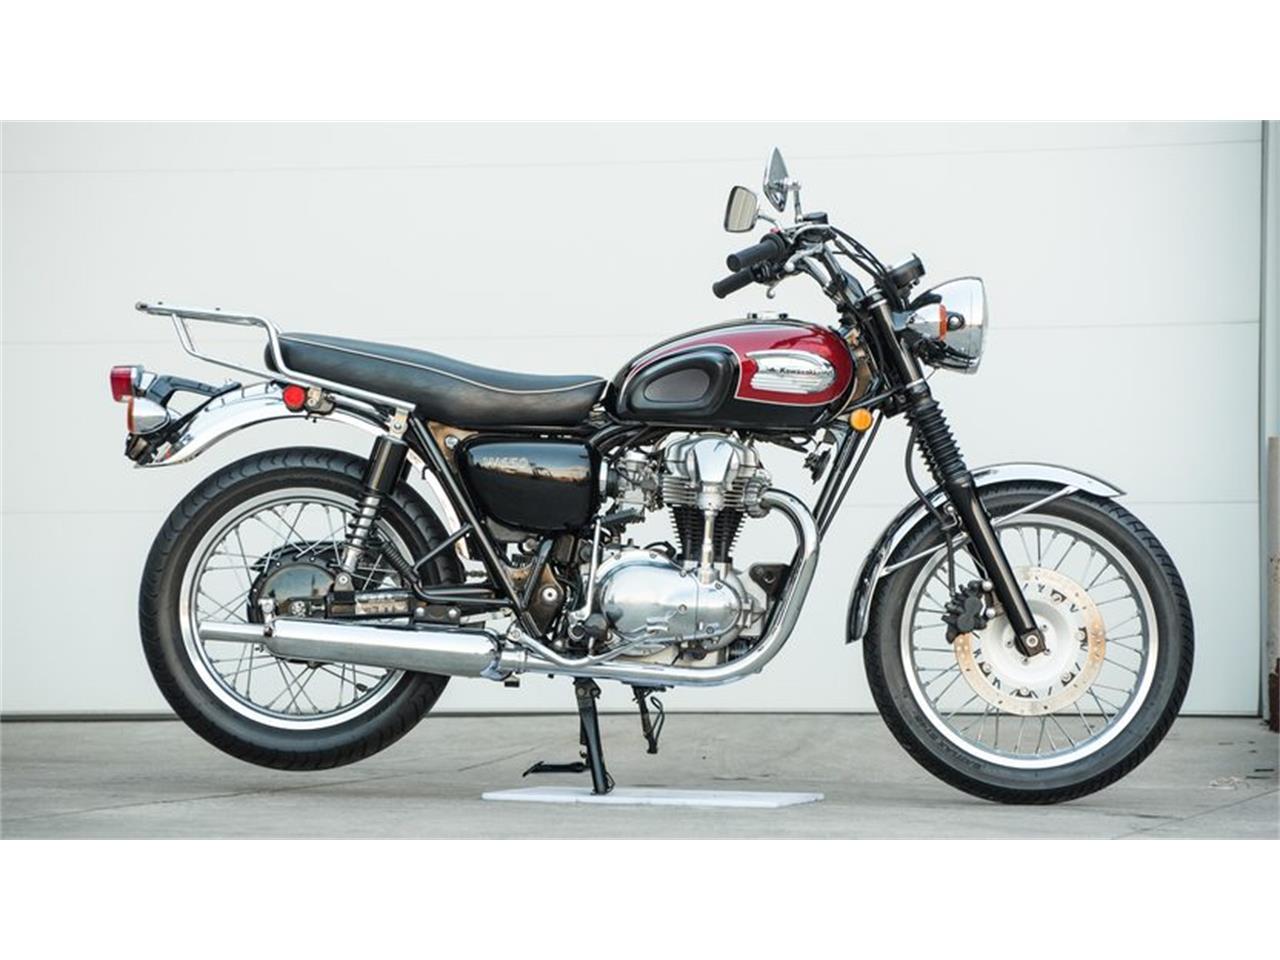 2000 Kawasaki W650 For Sale Classiccarscom Cc 929732